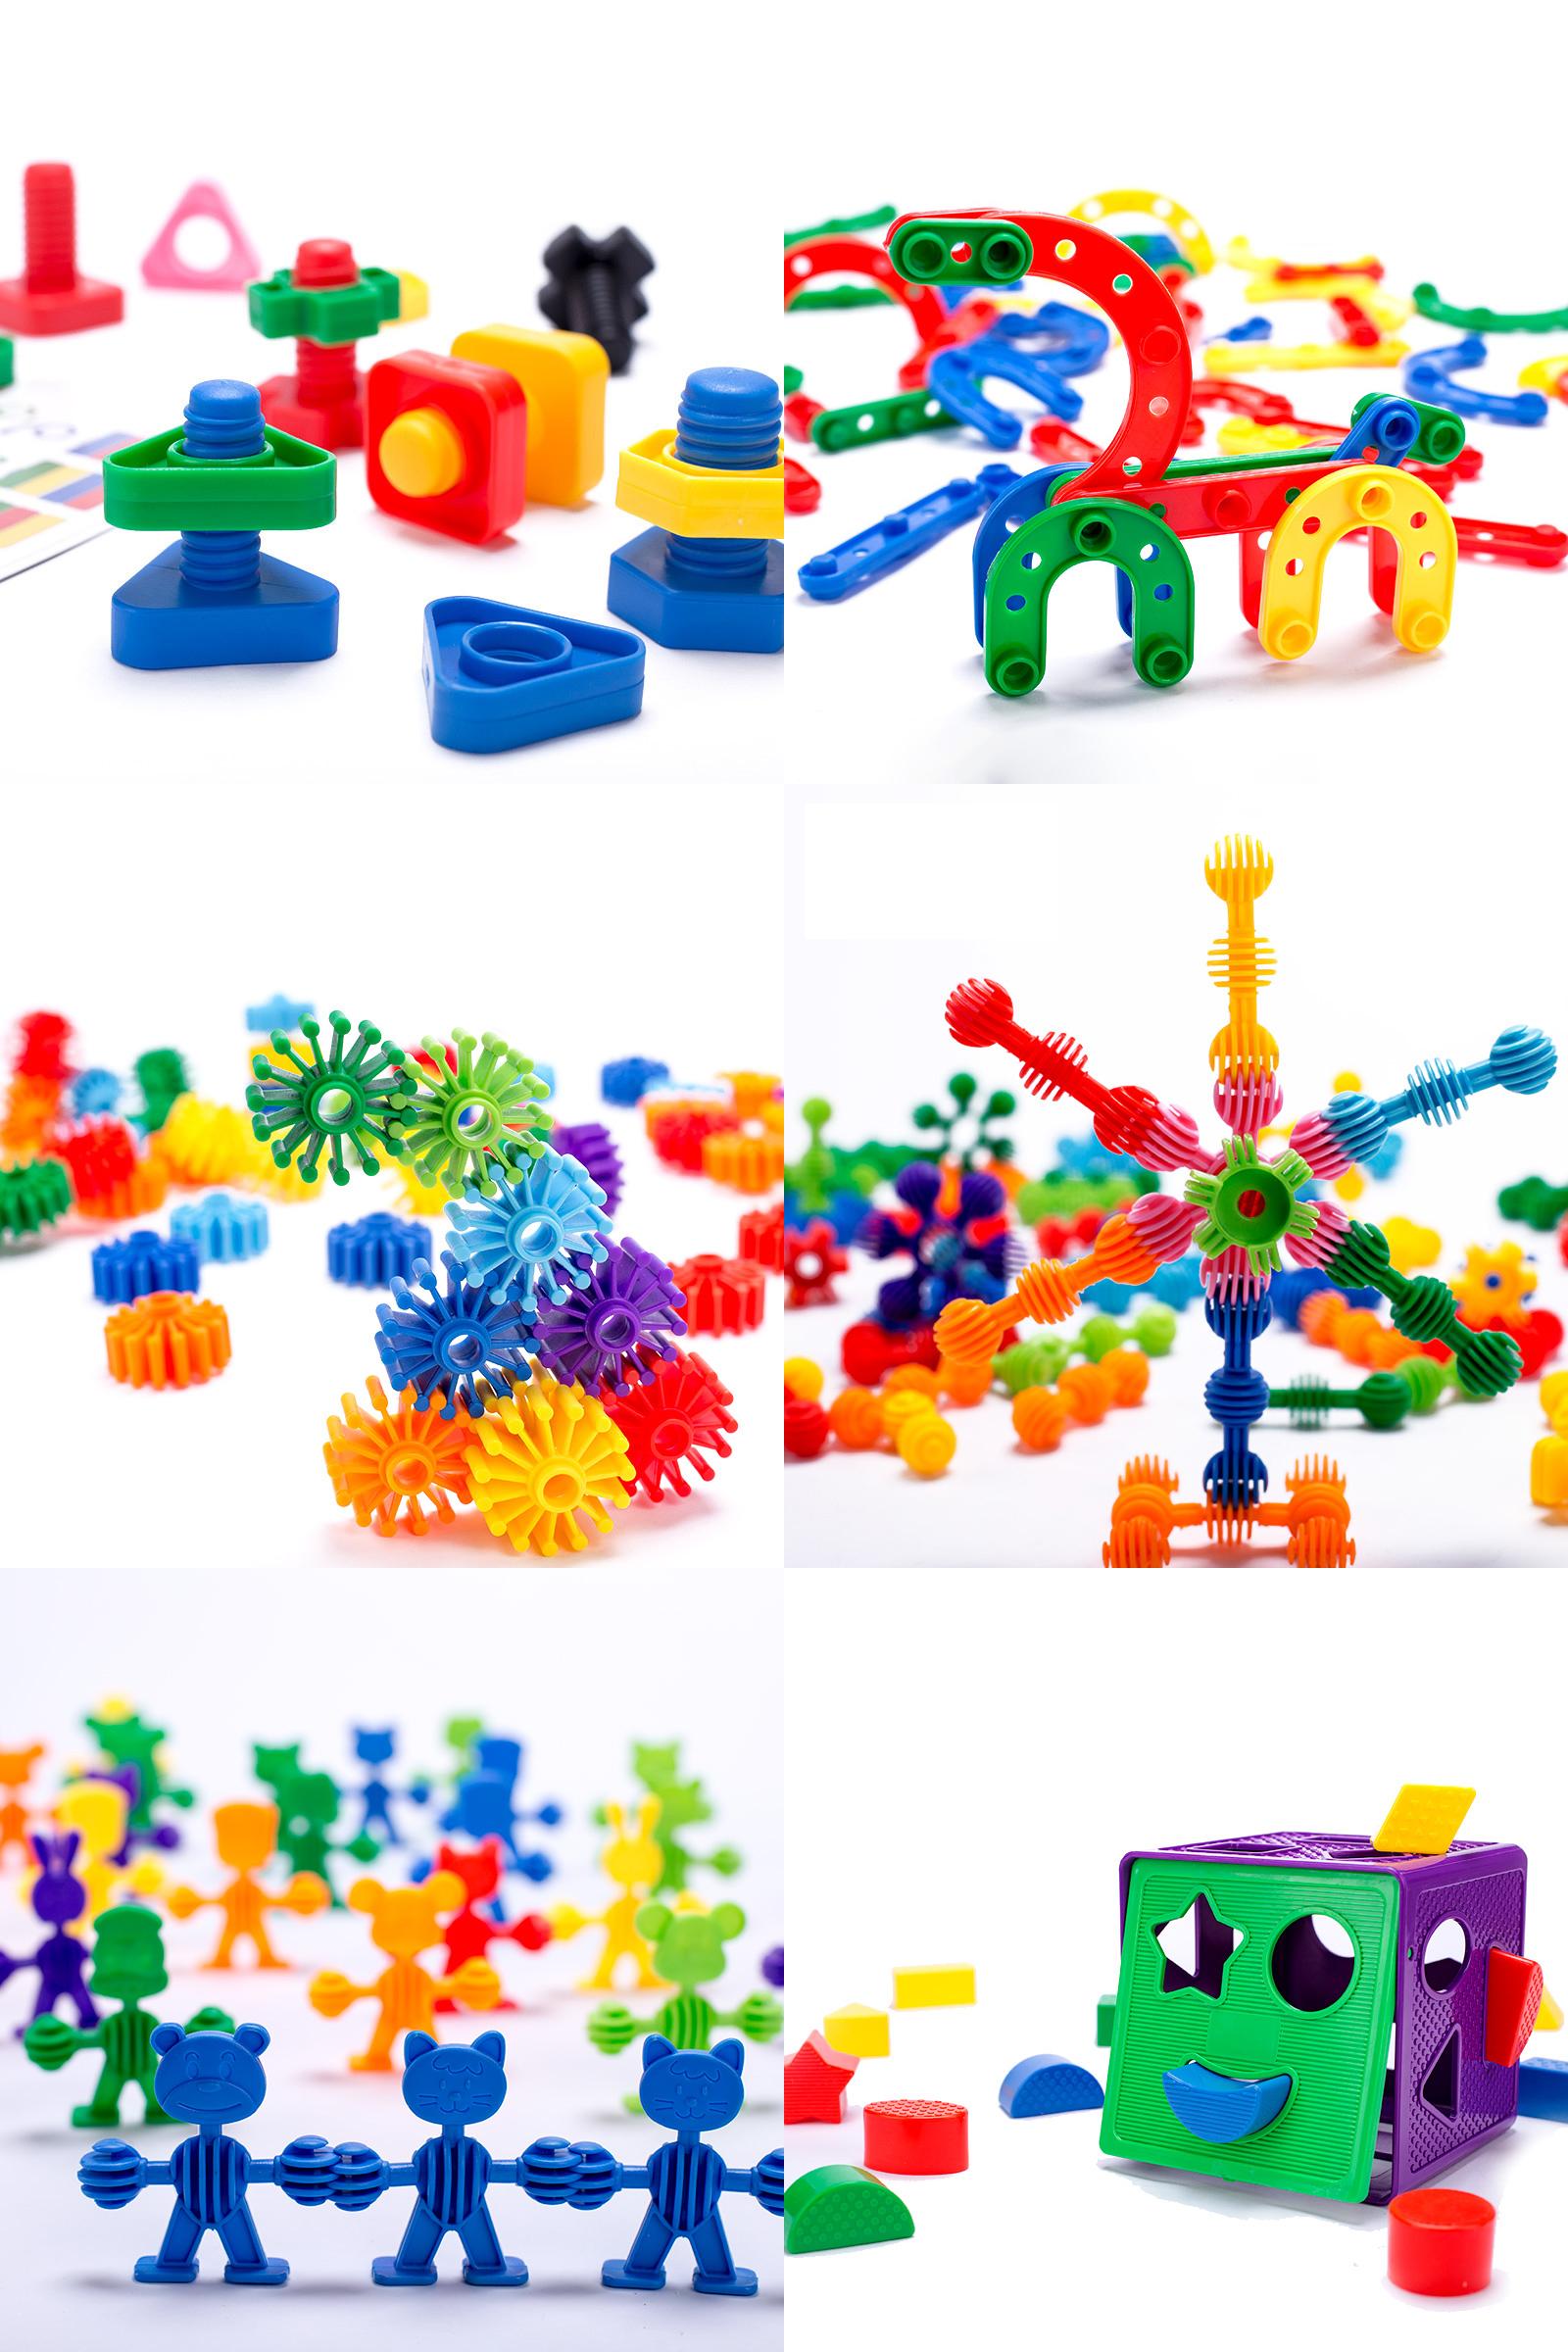 Popular Diy Children Intellectual Development Toys ...